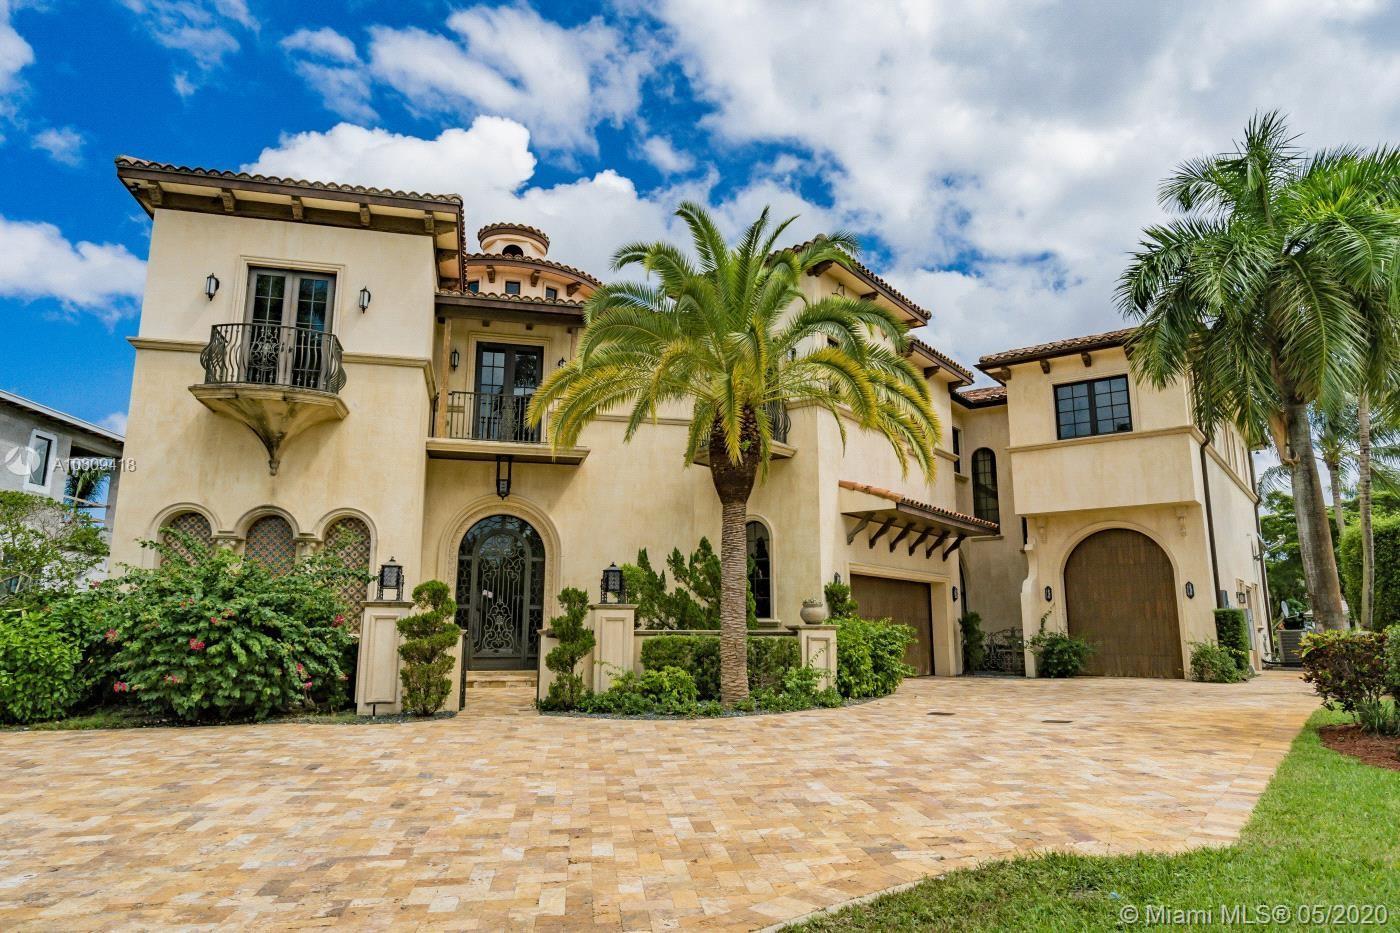 17828 Scarsdale Way Property Photo - Boca Raton, FL real estate listing